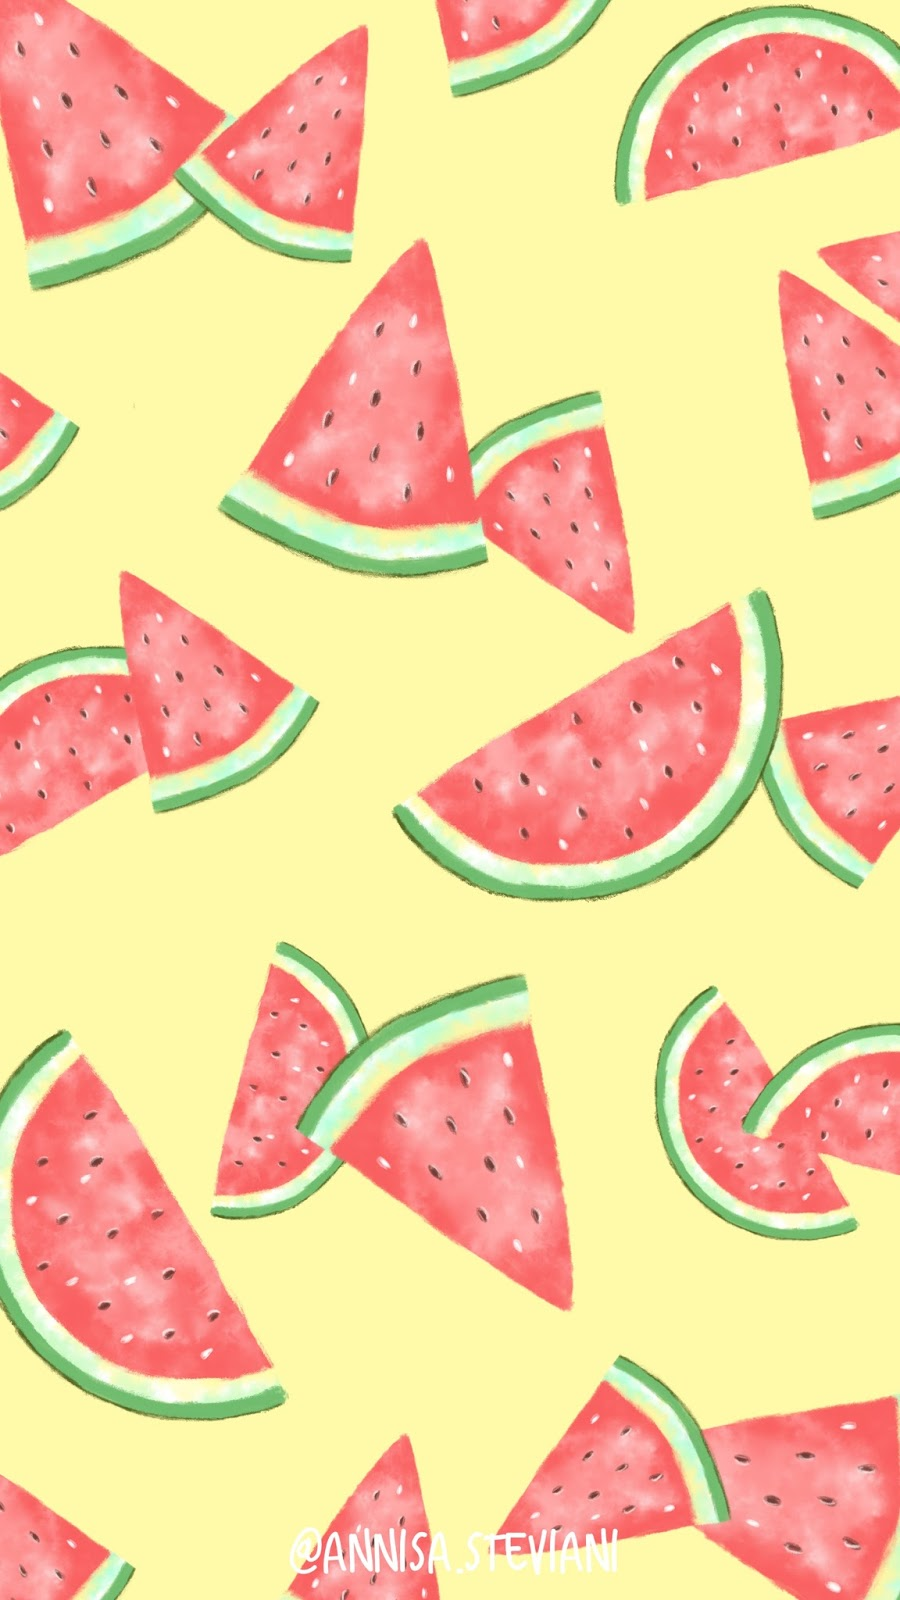 watermelon%2Byellow%2Bpink%2Bwatercolor%2Bwallpaper%2Biphone